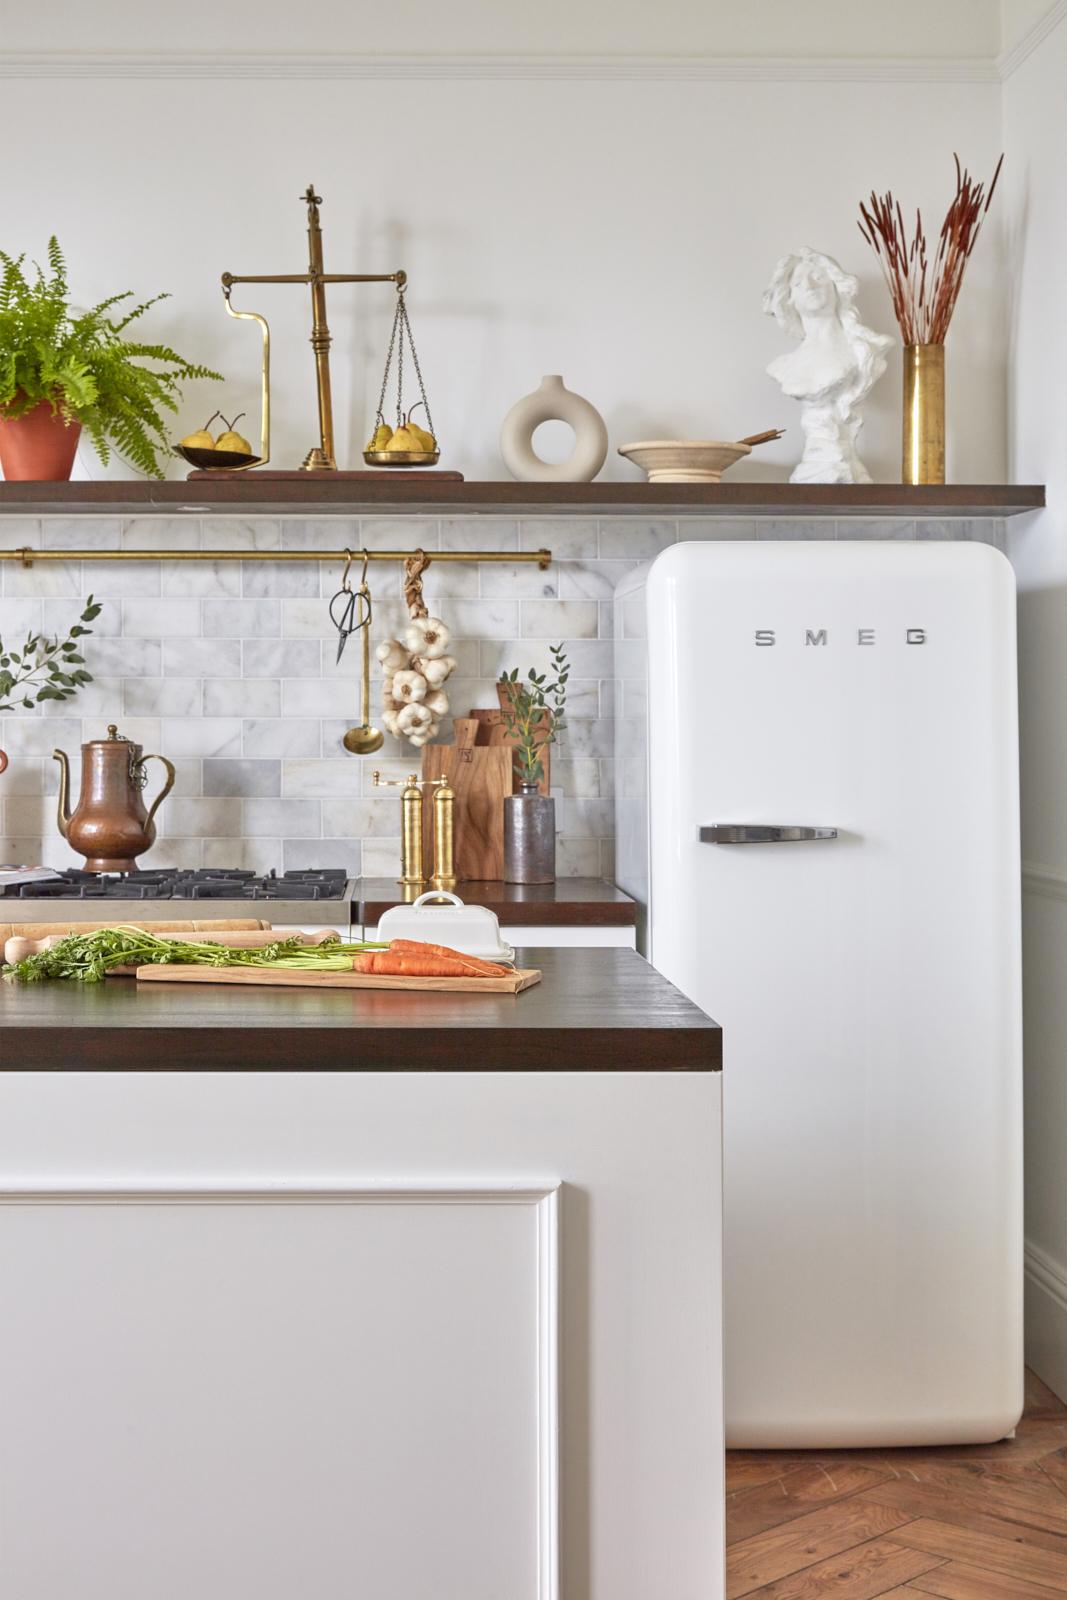 Belle Vue Georgian apartment renovated kitchen with SMEG fridge